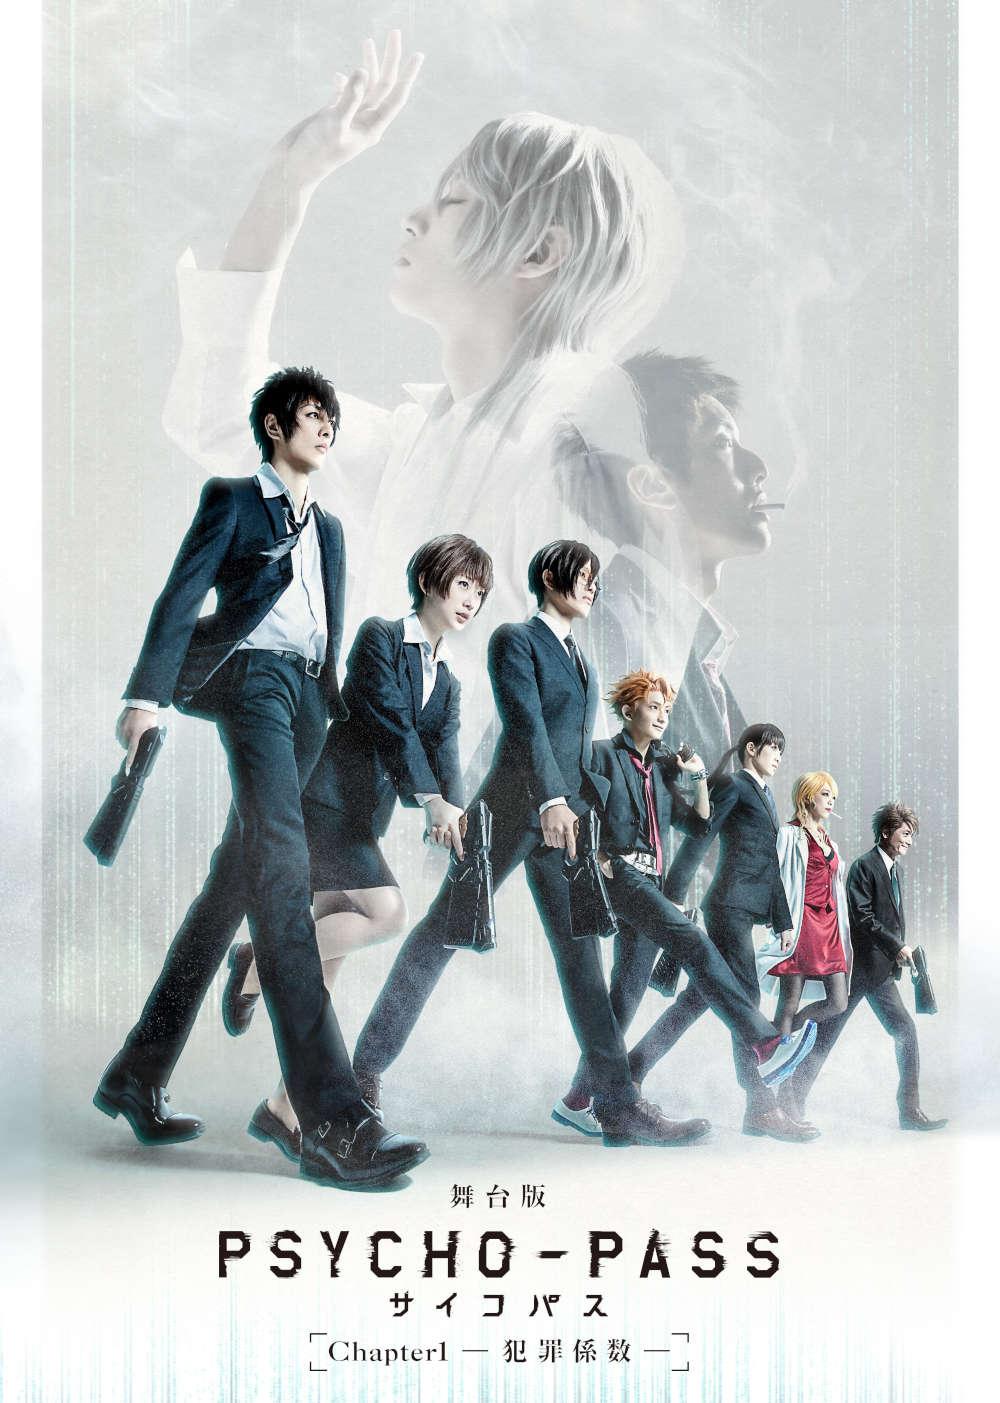 【会場予約限定特典付】舞台版『PSYCHO-PASS サイコパス Chapter1 —犯罪係数—』 Blu-ray